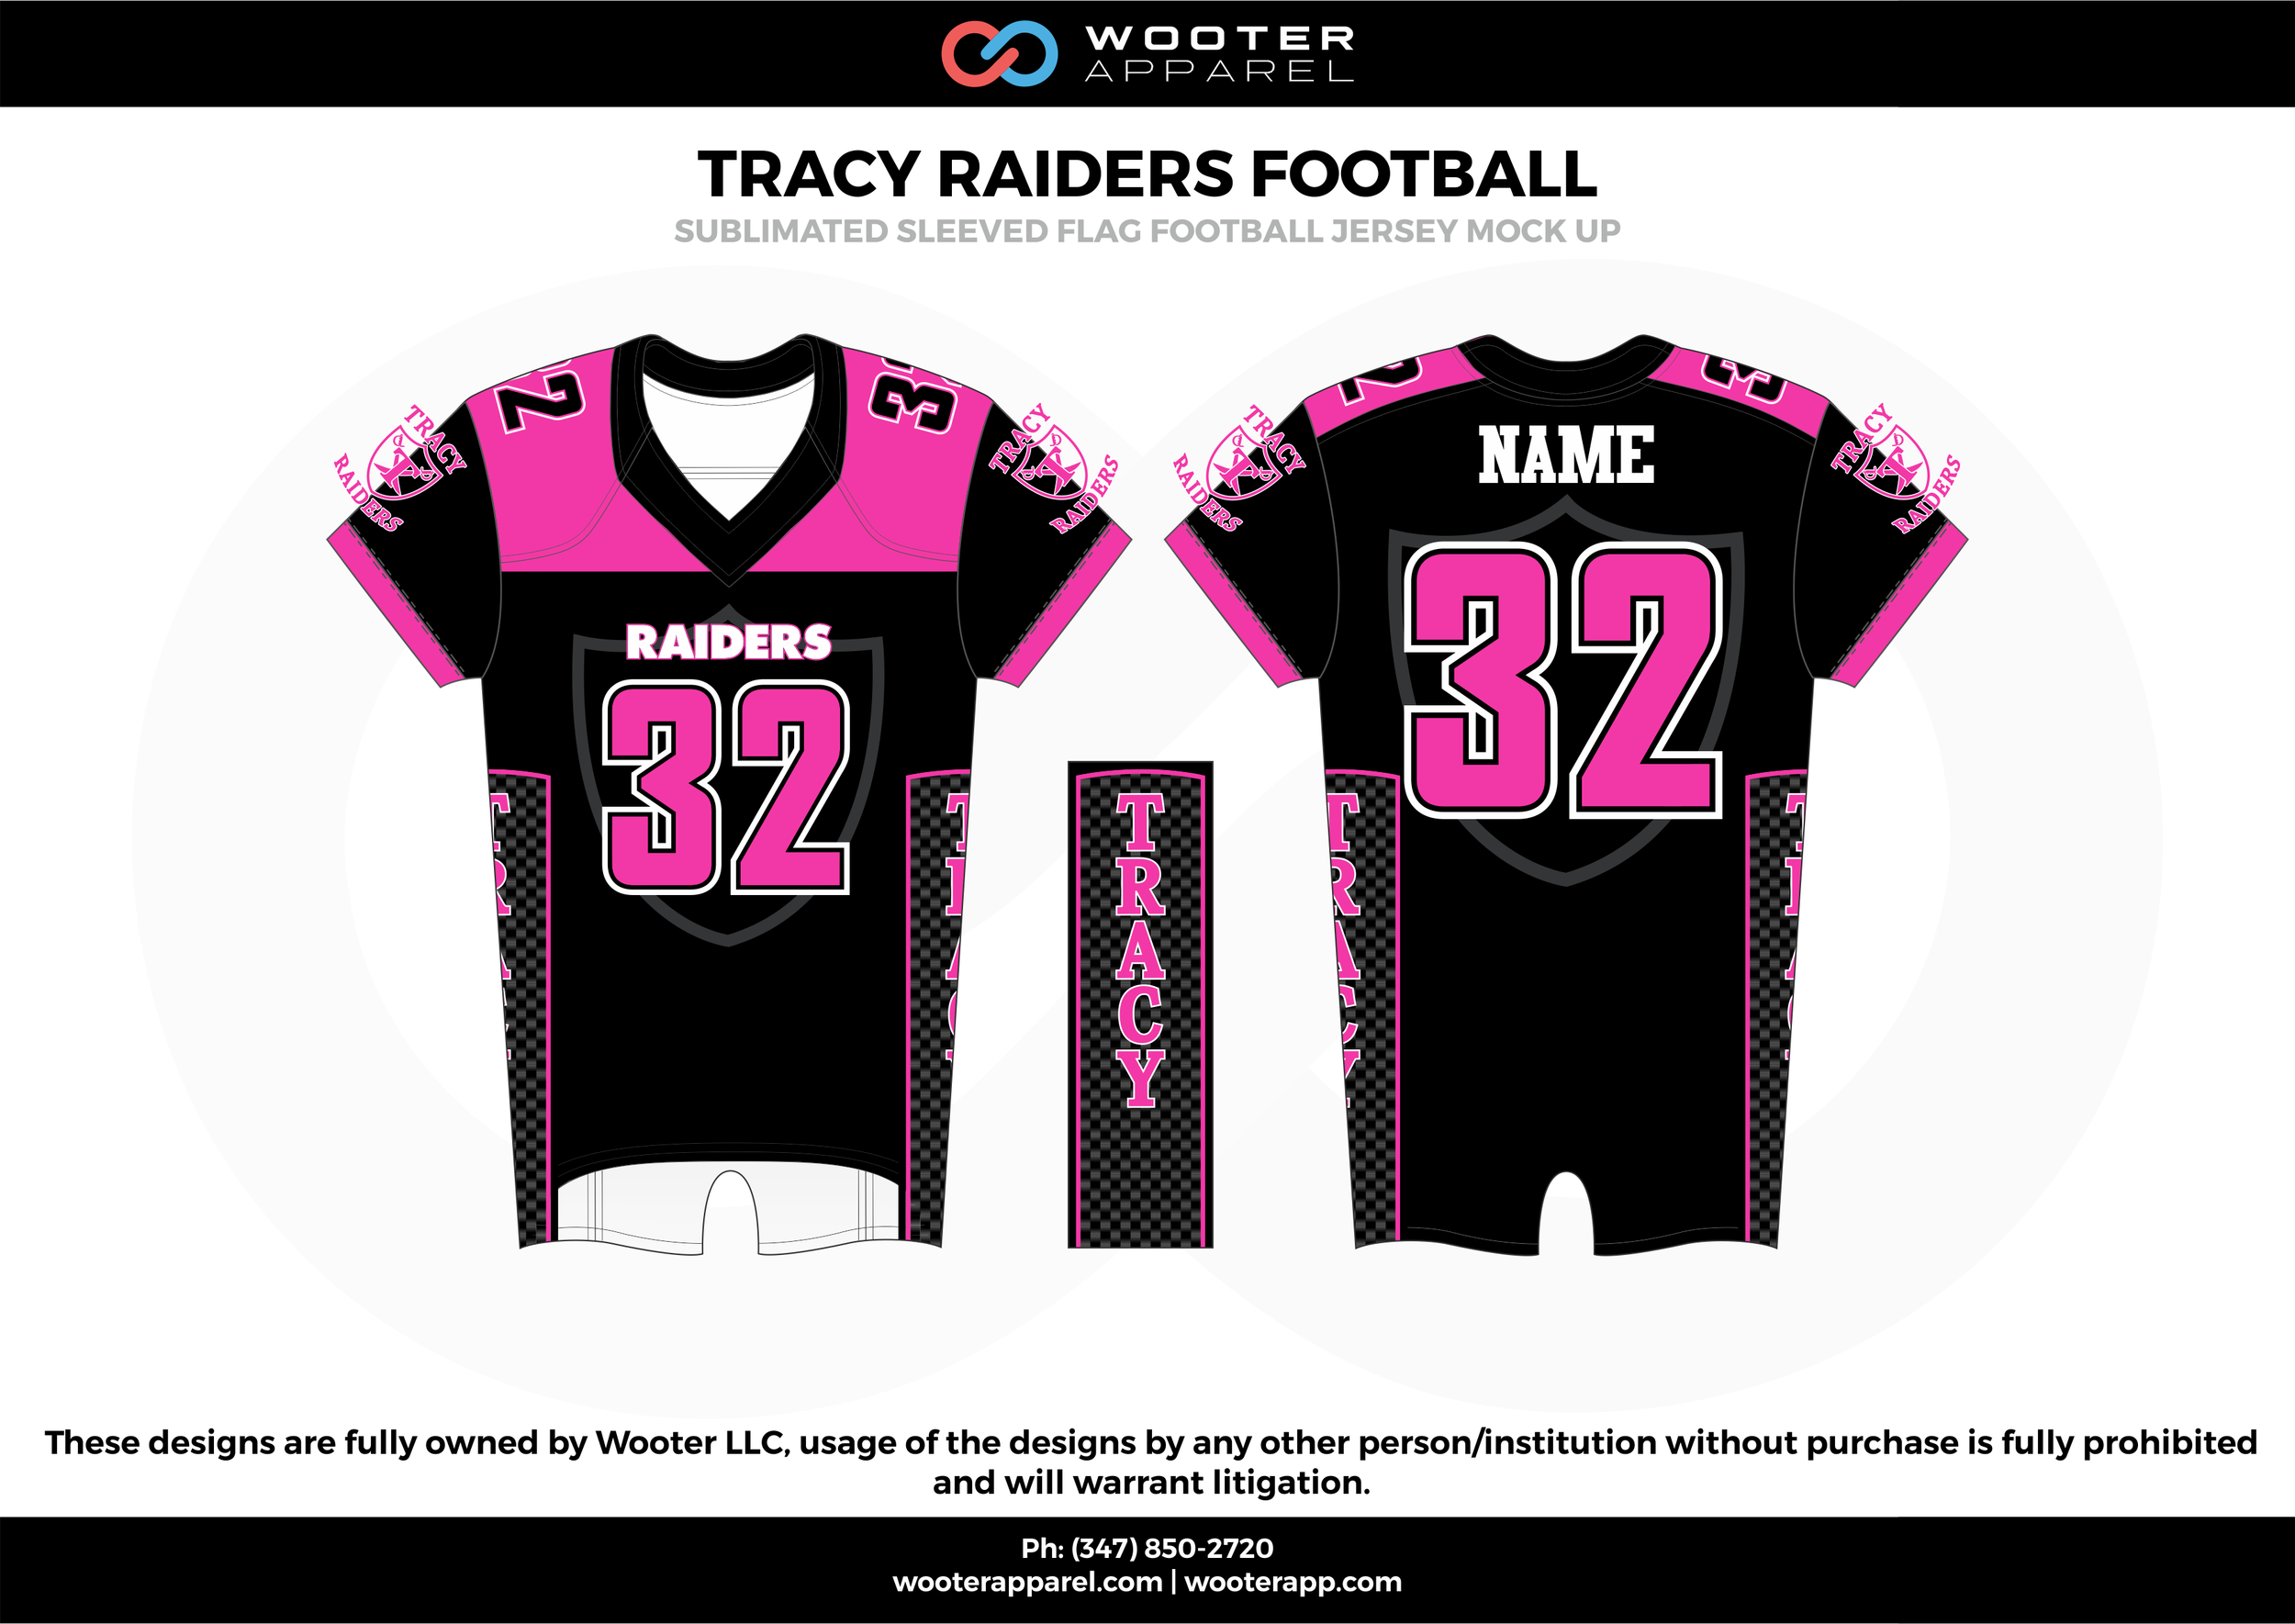 TRACY RAIDERS FOOTBALL pink black white flag football uniforms jerseys tops